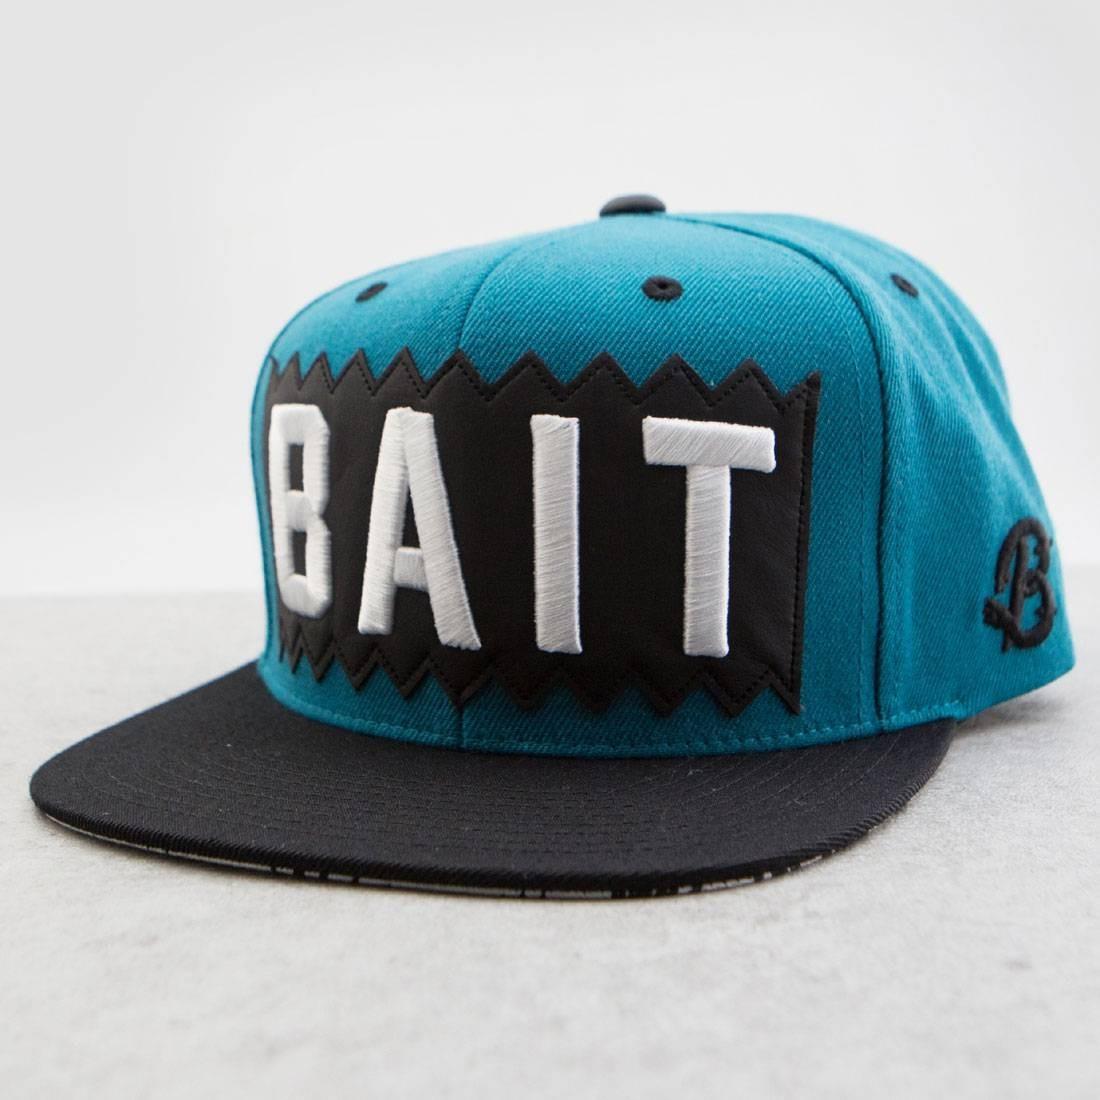 BAIT x Mitchell And Ness Box Logo Snapback Cap (turquoise / black)